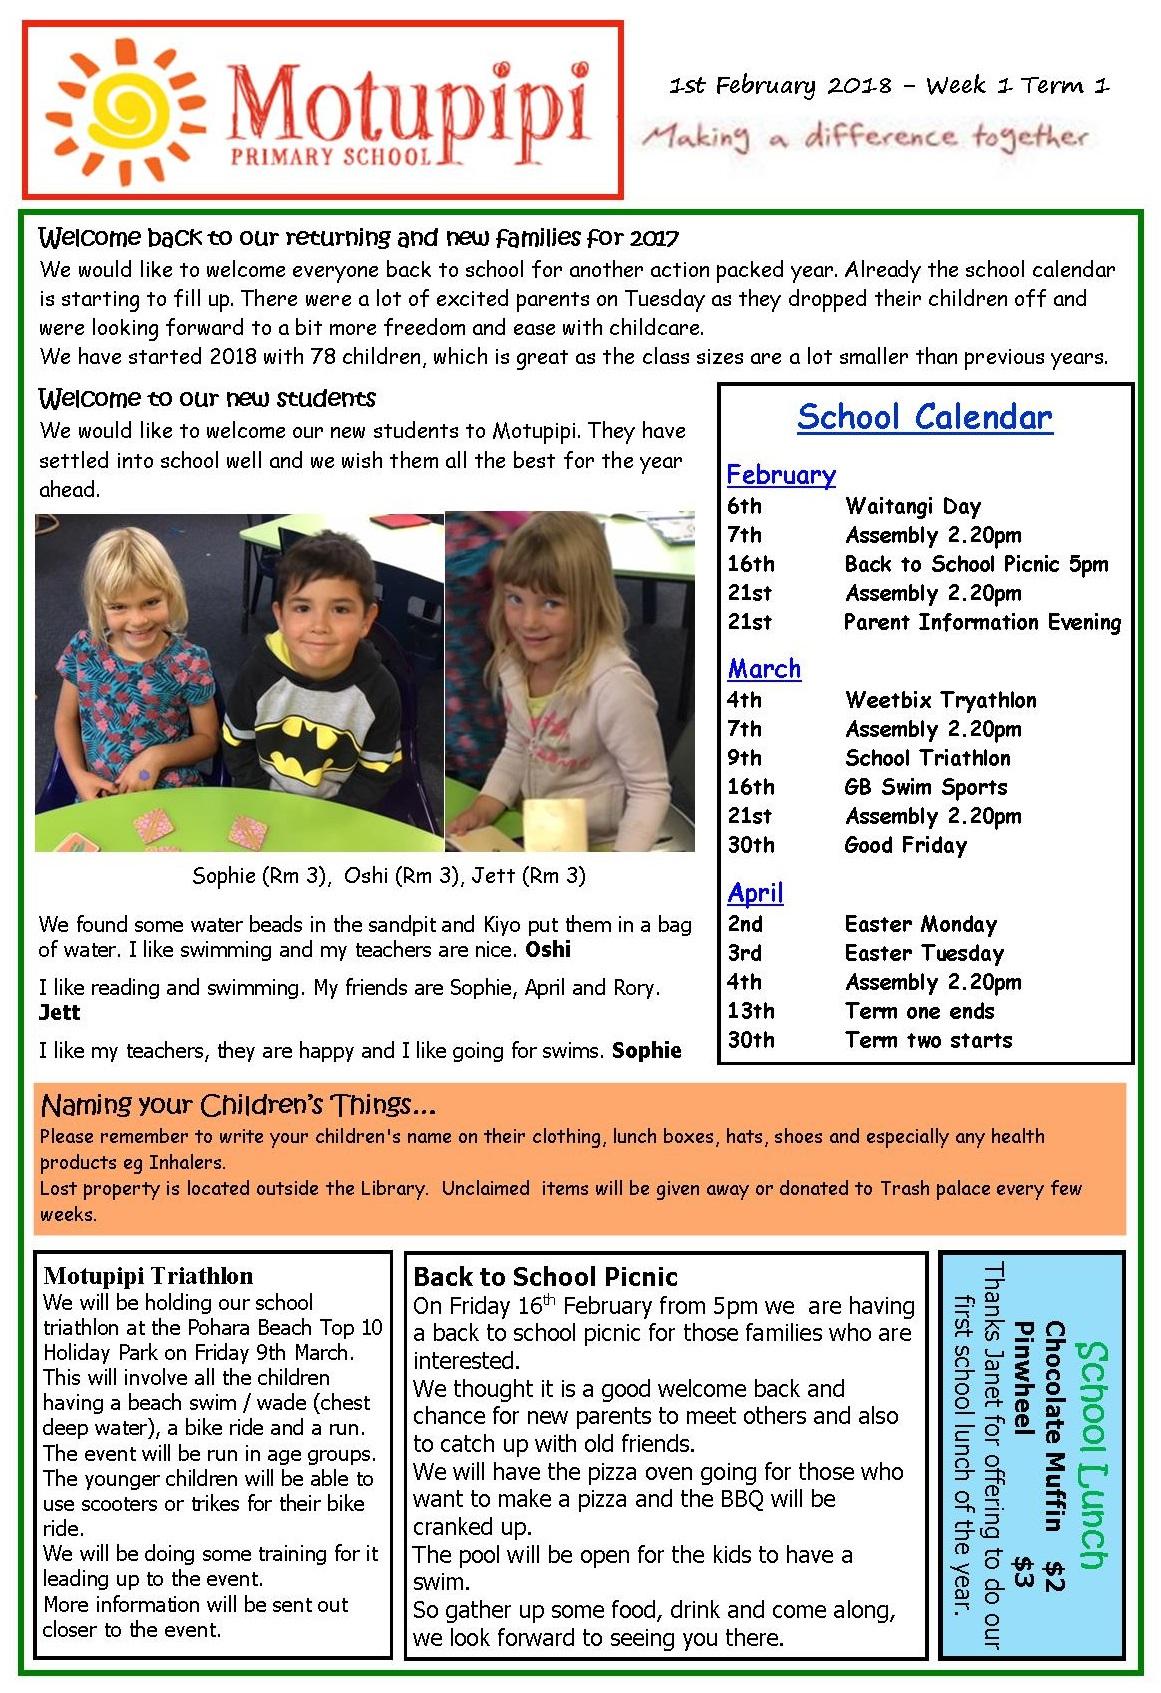 1st Feb Page 1.jpg